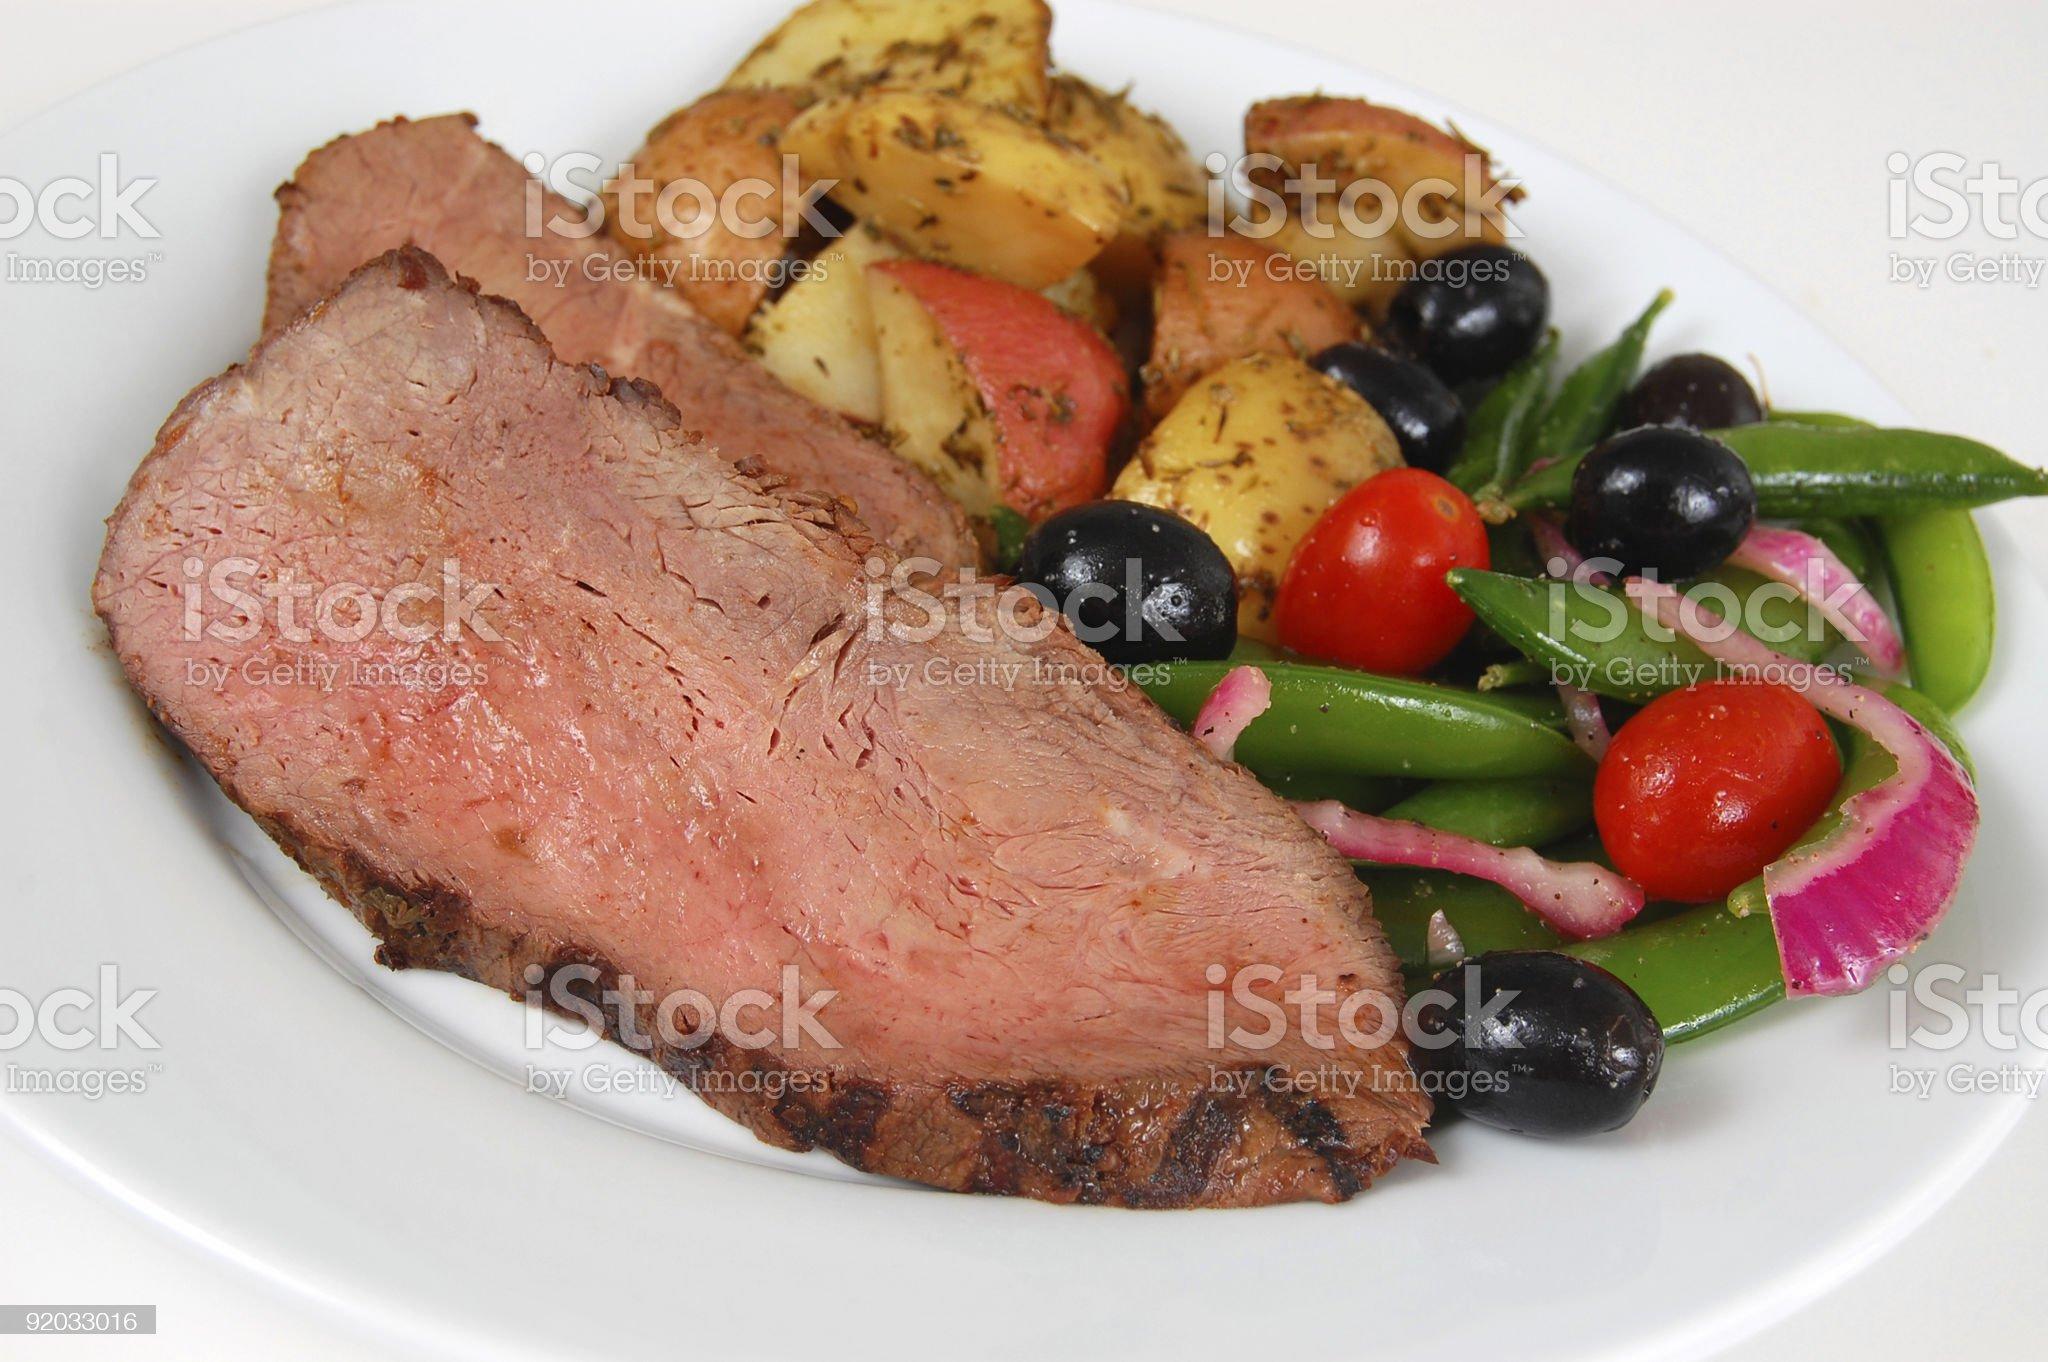 Sirloin Steak royalty-free stock photo